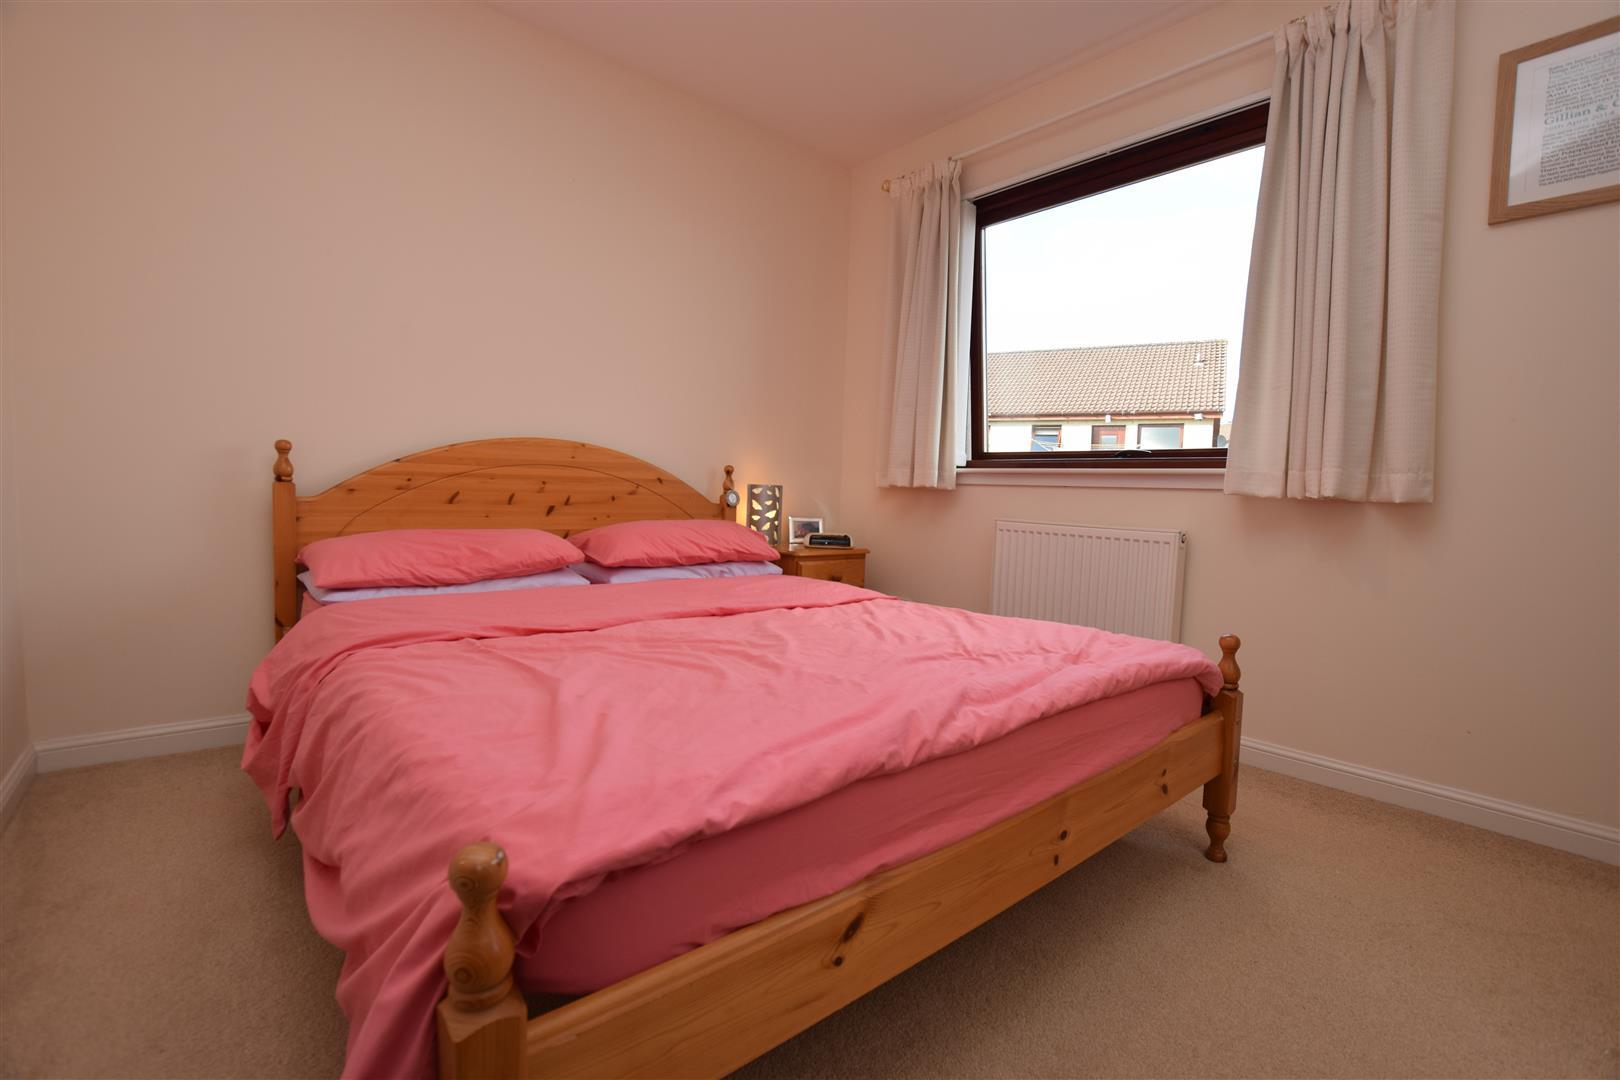 24, Honeyberry Crescent, Rattray, BLAIRGOWRIE, Perthshire, PH10 7RD, UK